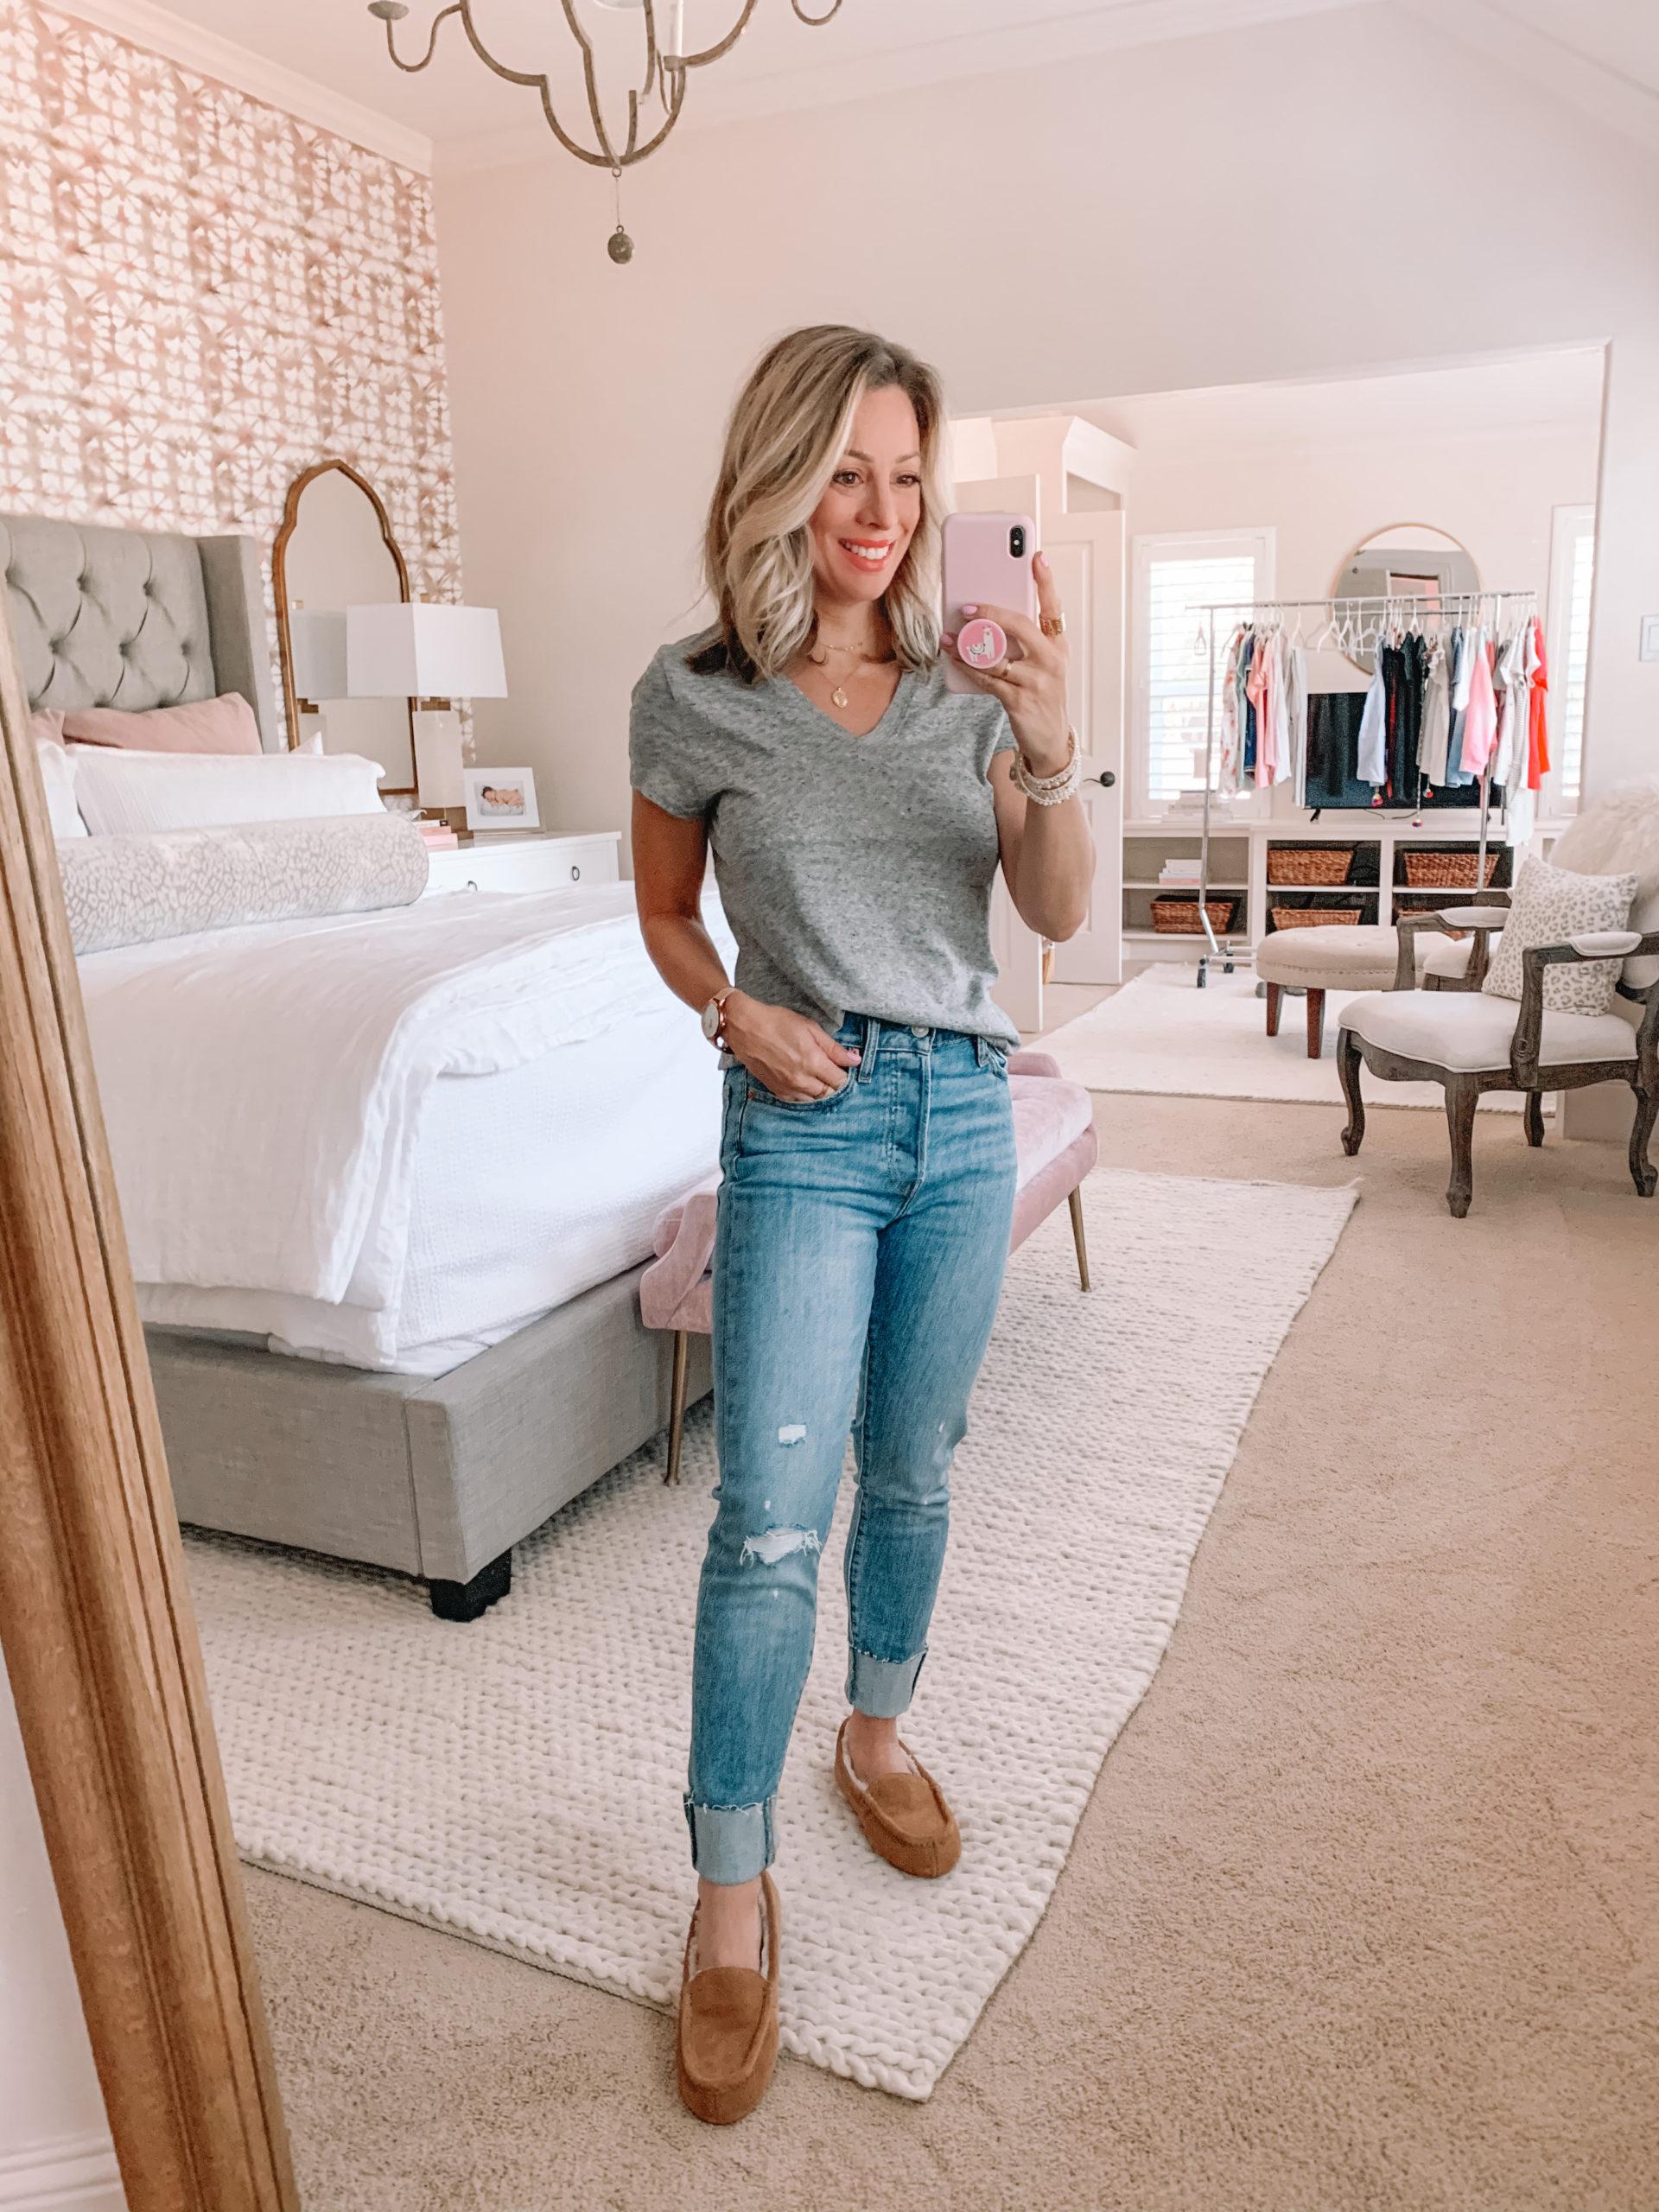 Amazon Haul - grey tee and jeans